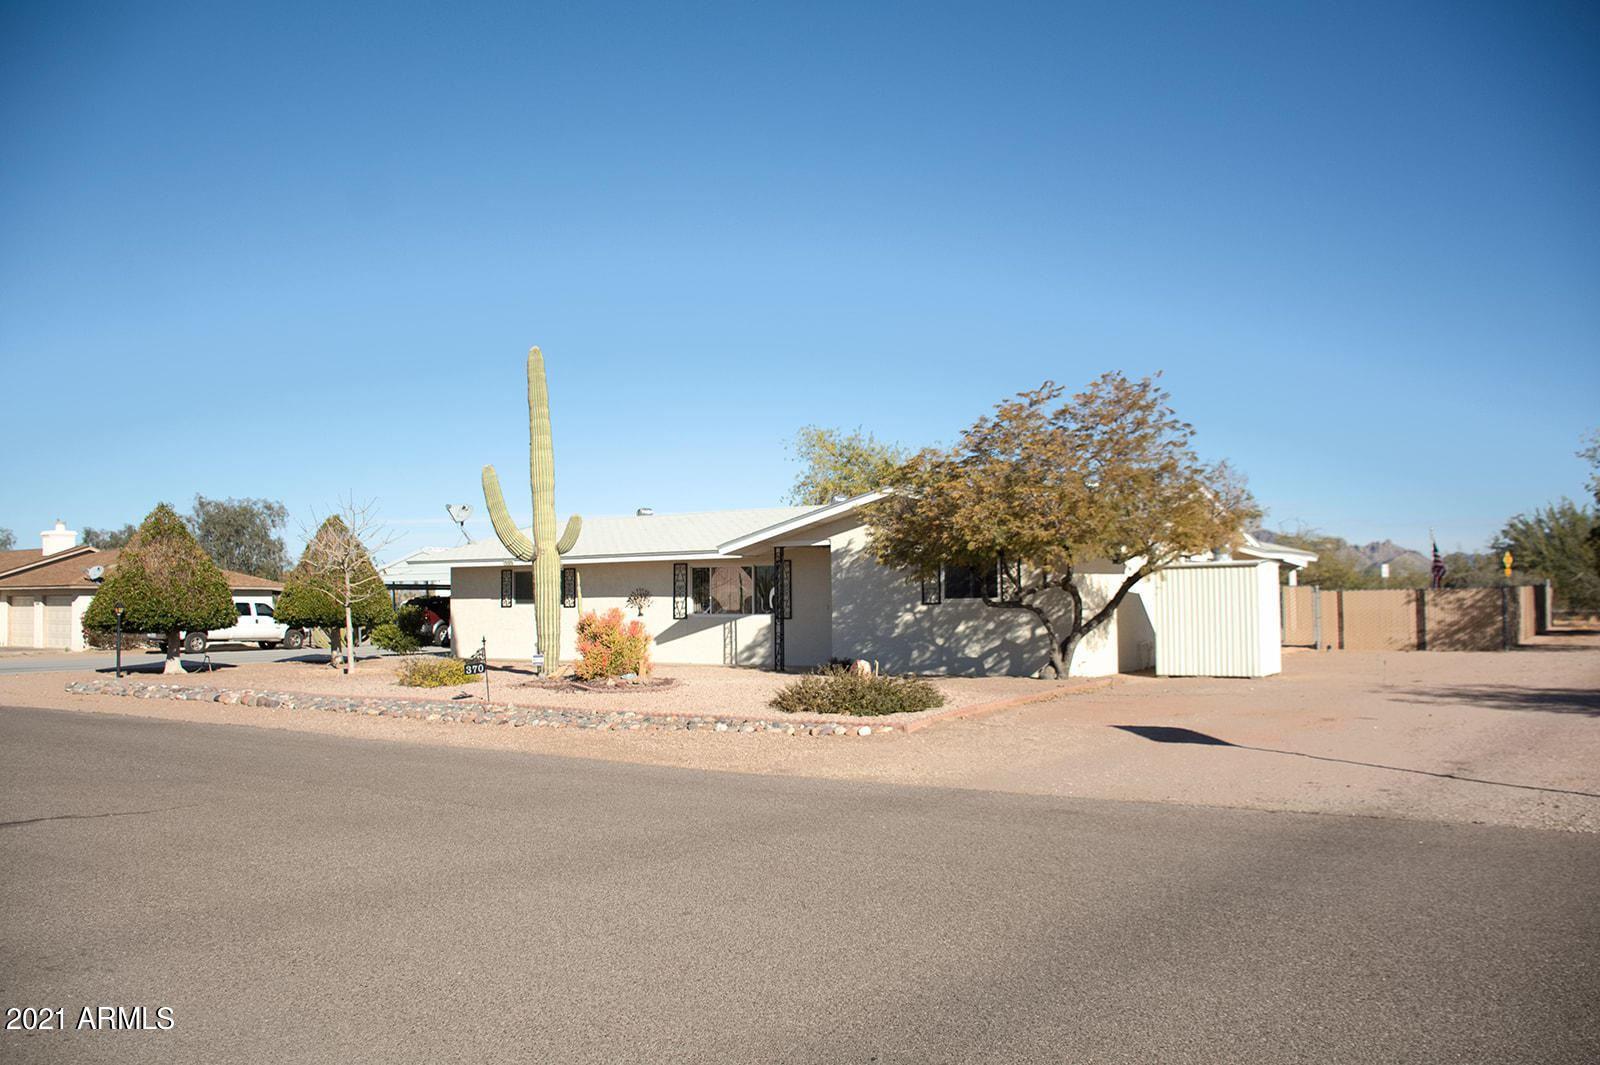 Photo of 370 E 12TH Avenue, Apache Junction, AZ 85119 (MLS # 6200778)